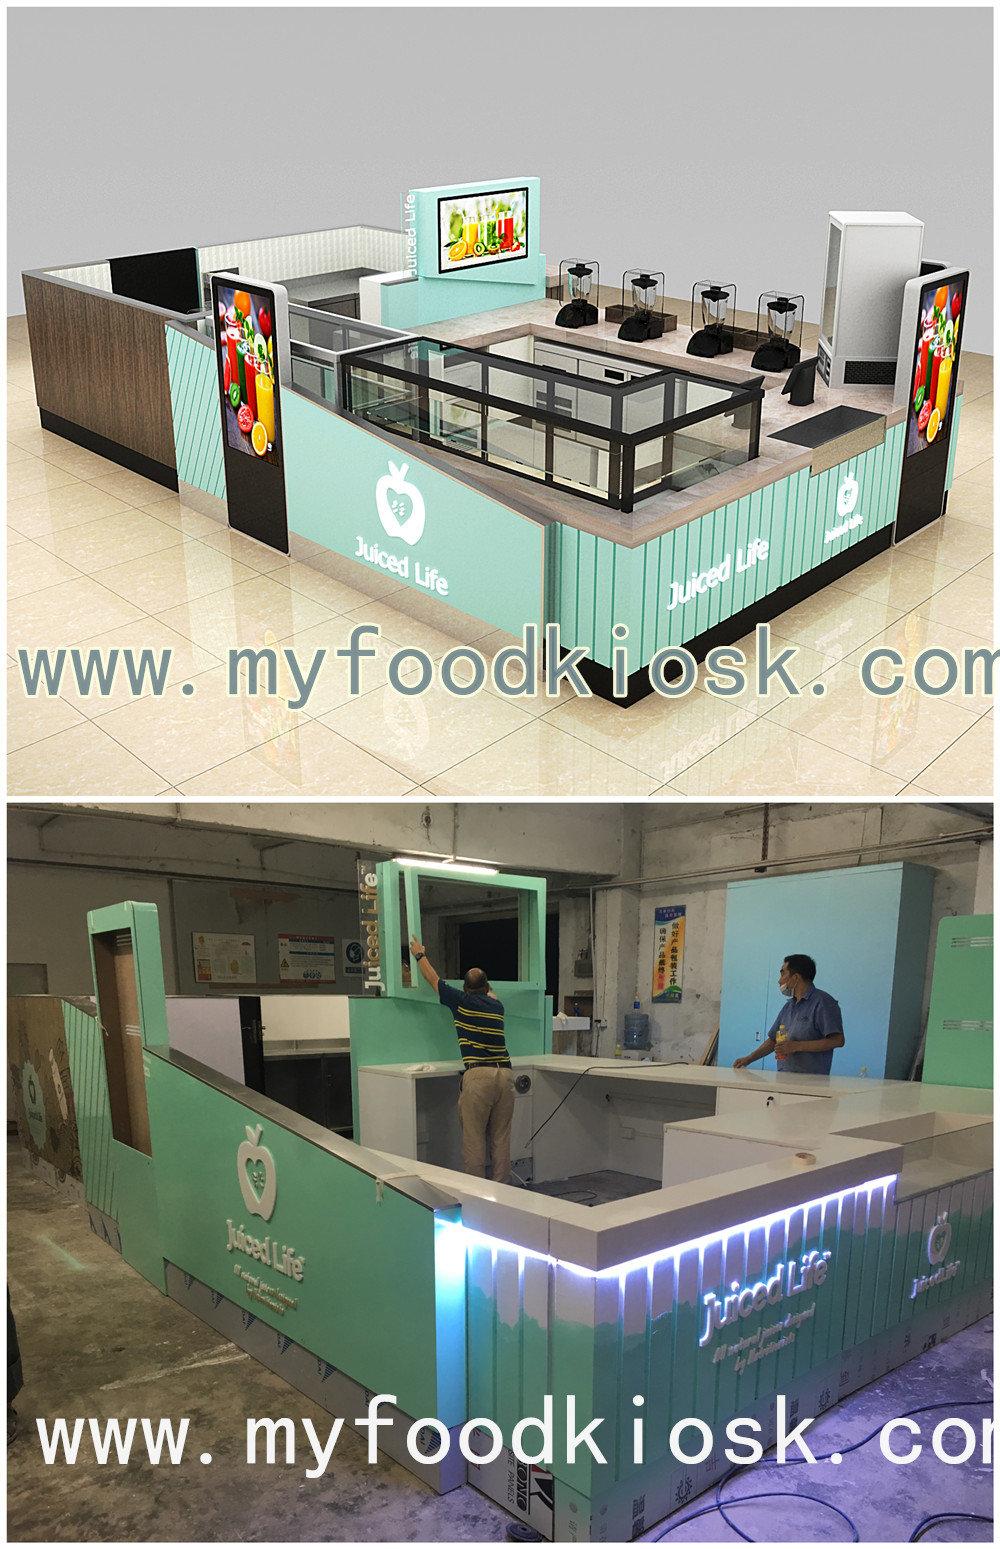 juice-bar-counter-kiosk-10